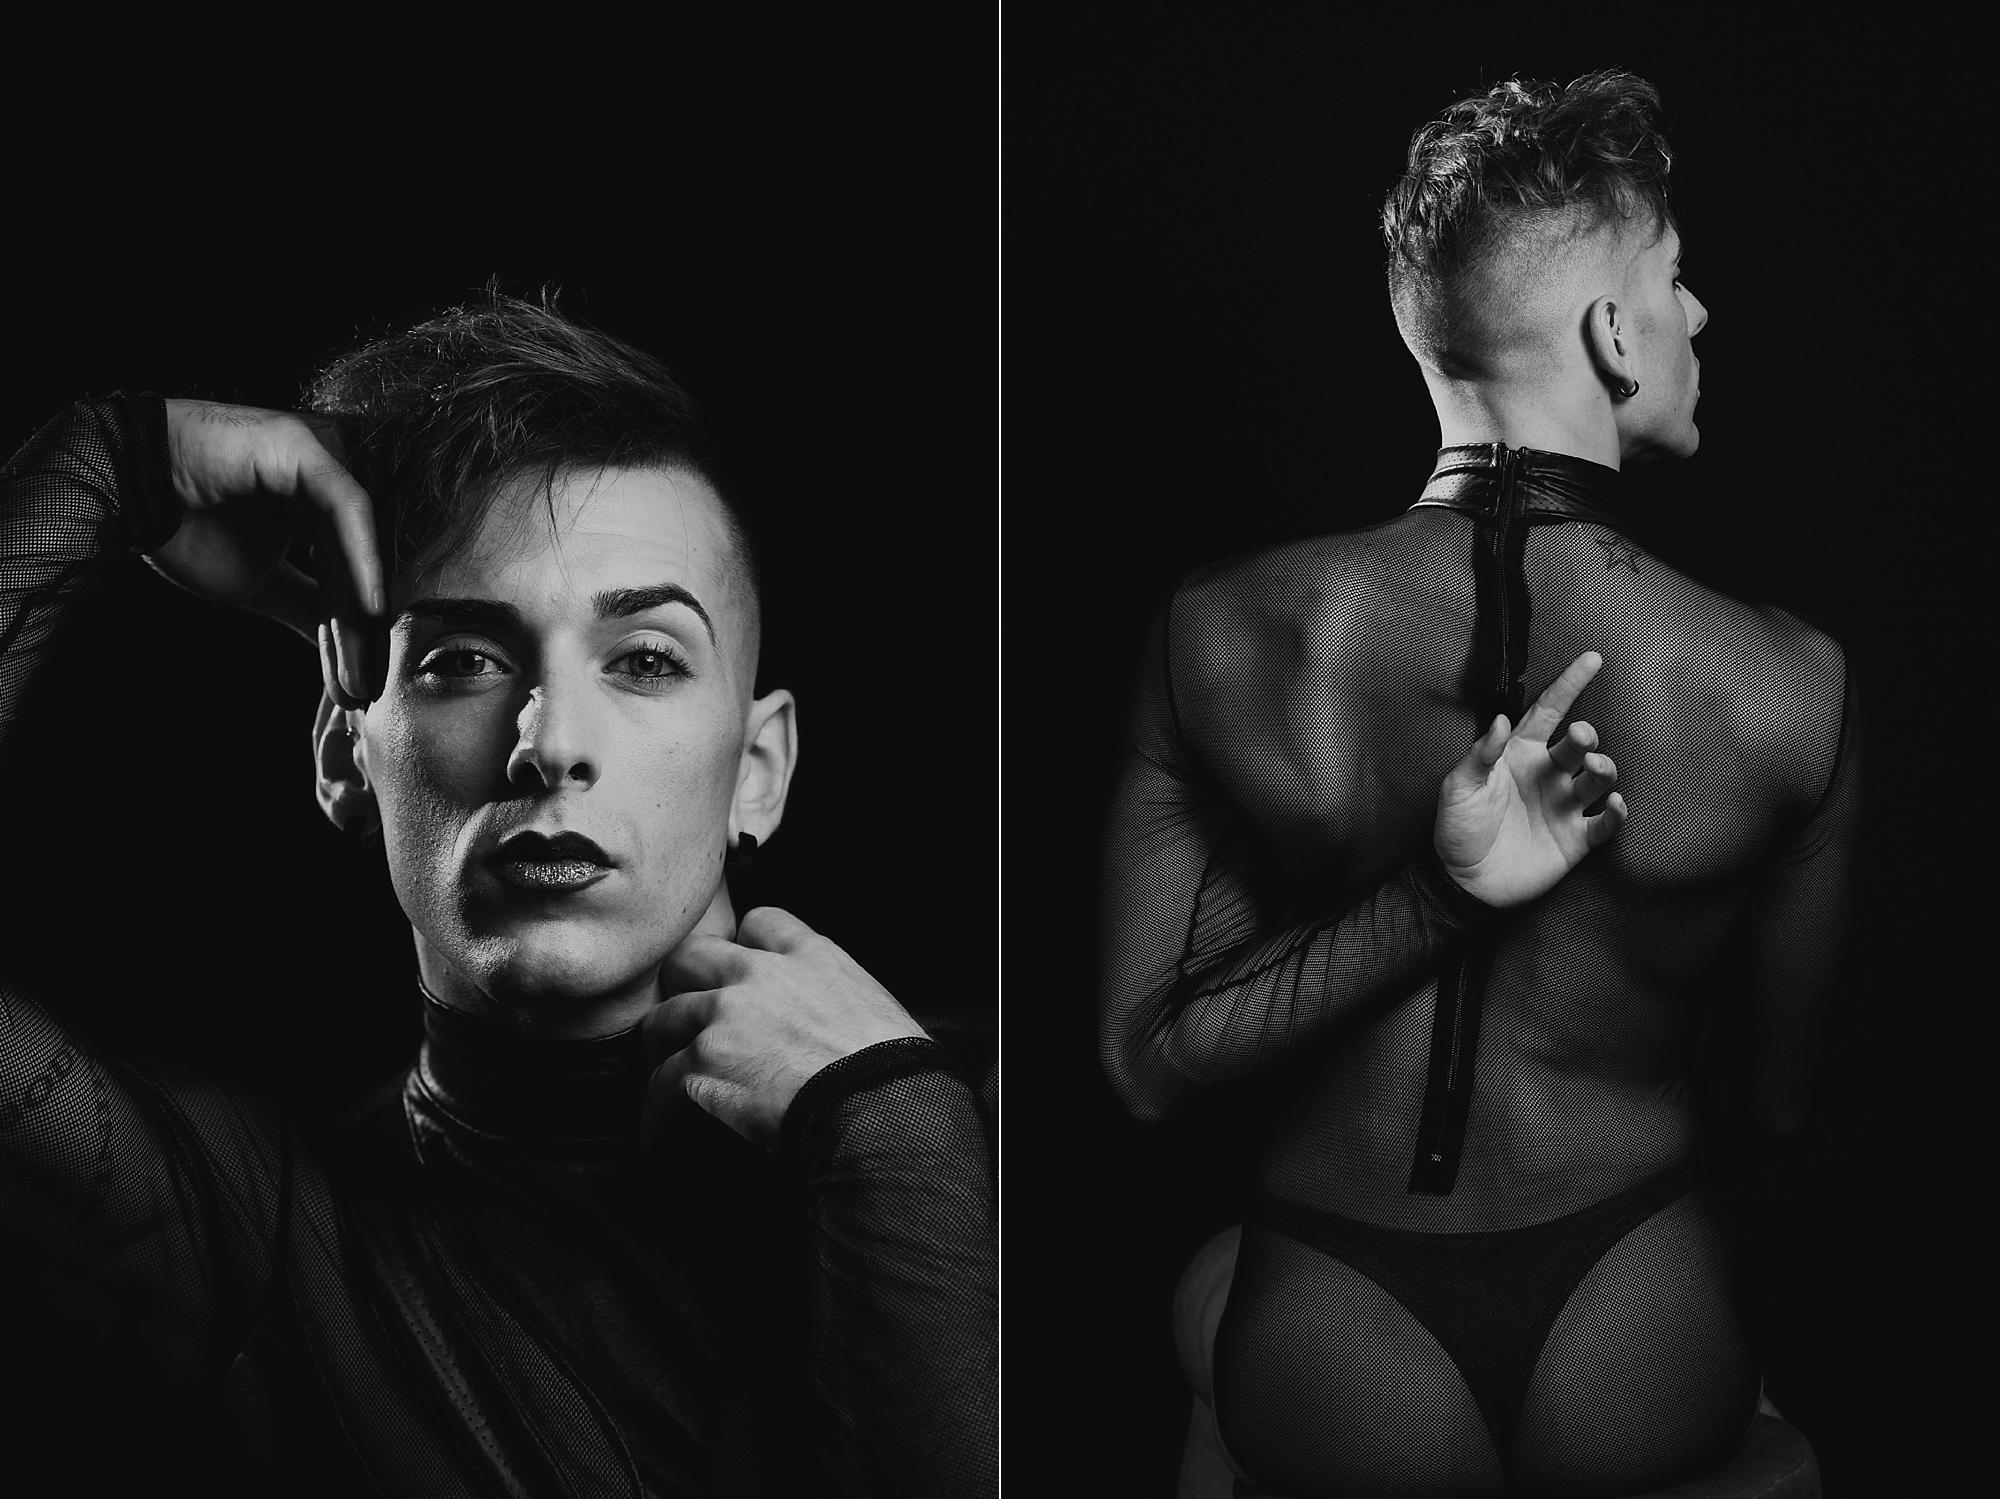 Joe_Mac_Creative_Joey_Arrigo_Philadelphia_Gay_Fashion_Photography__0016.jpg